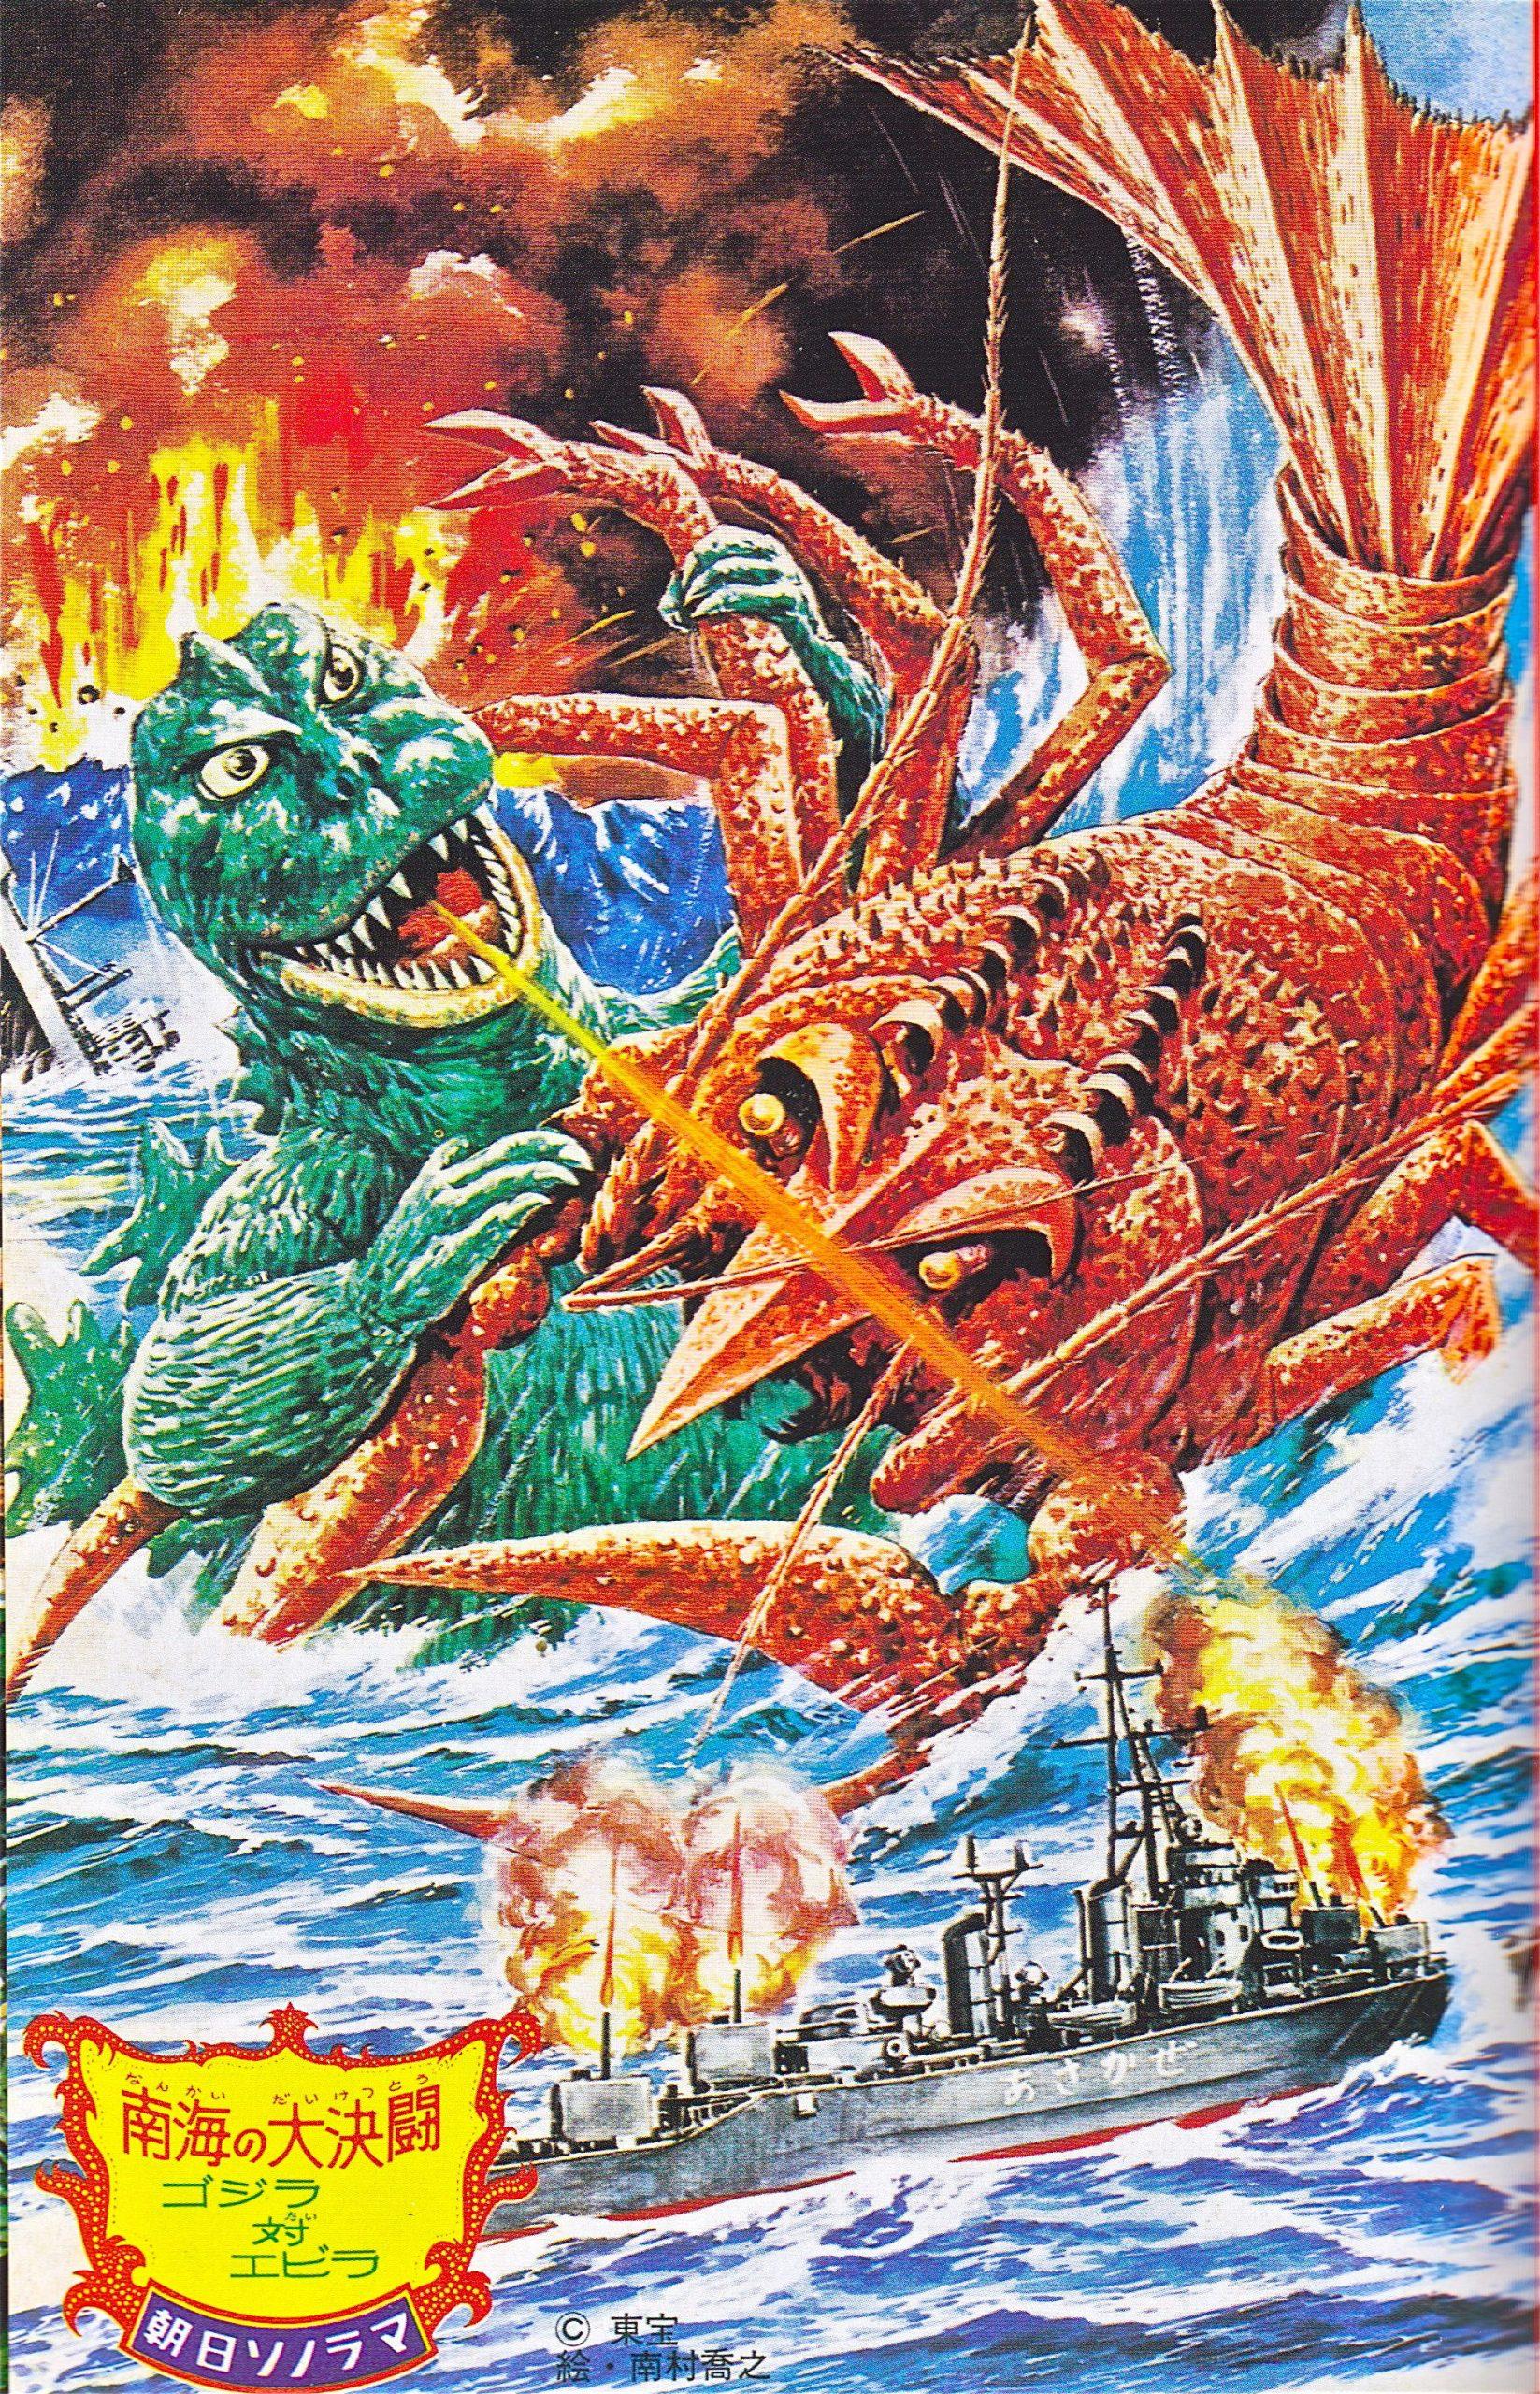 Godzilla Vs. The Sea Monster 9